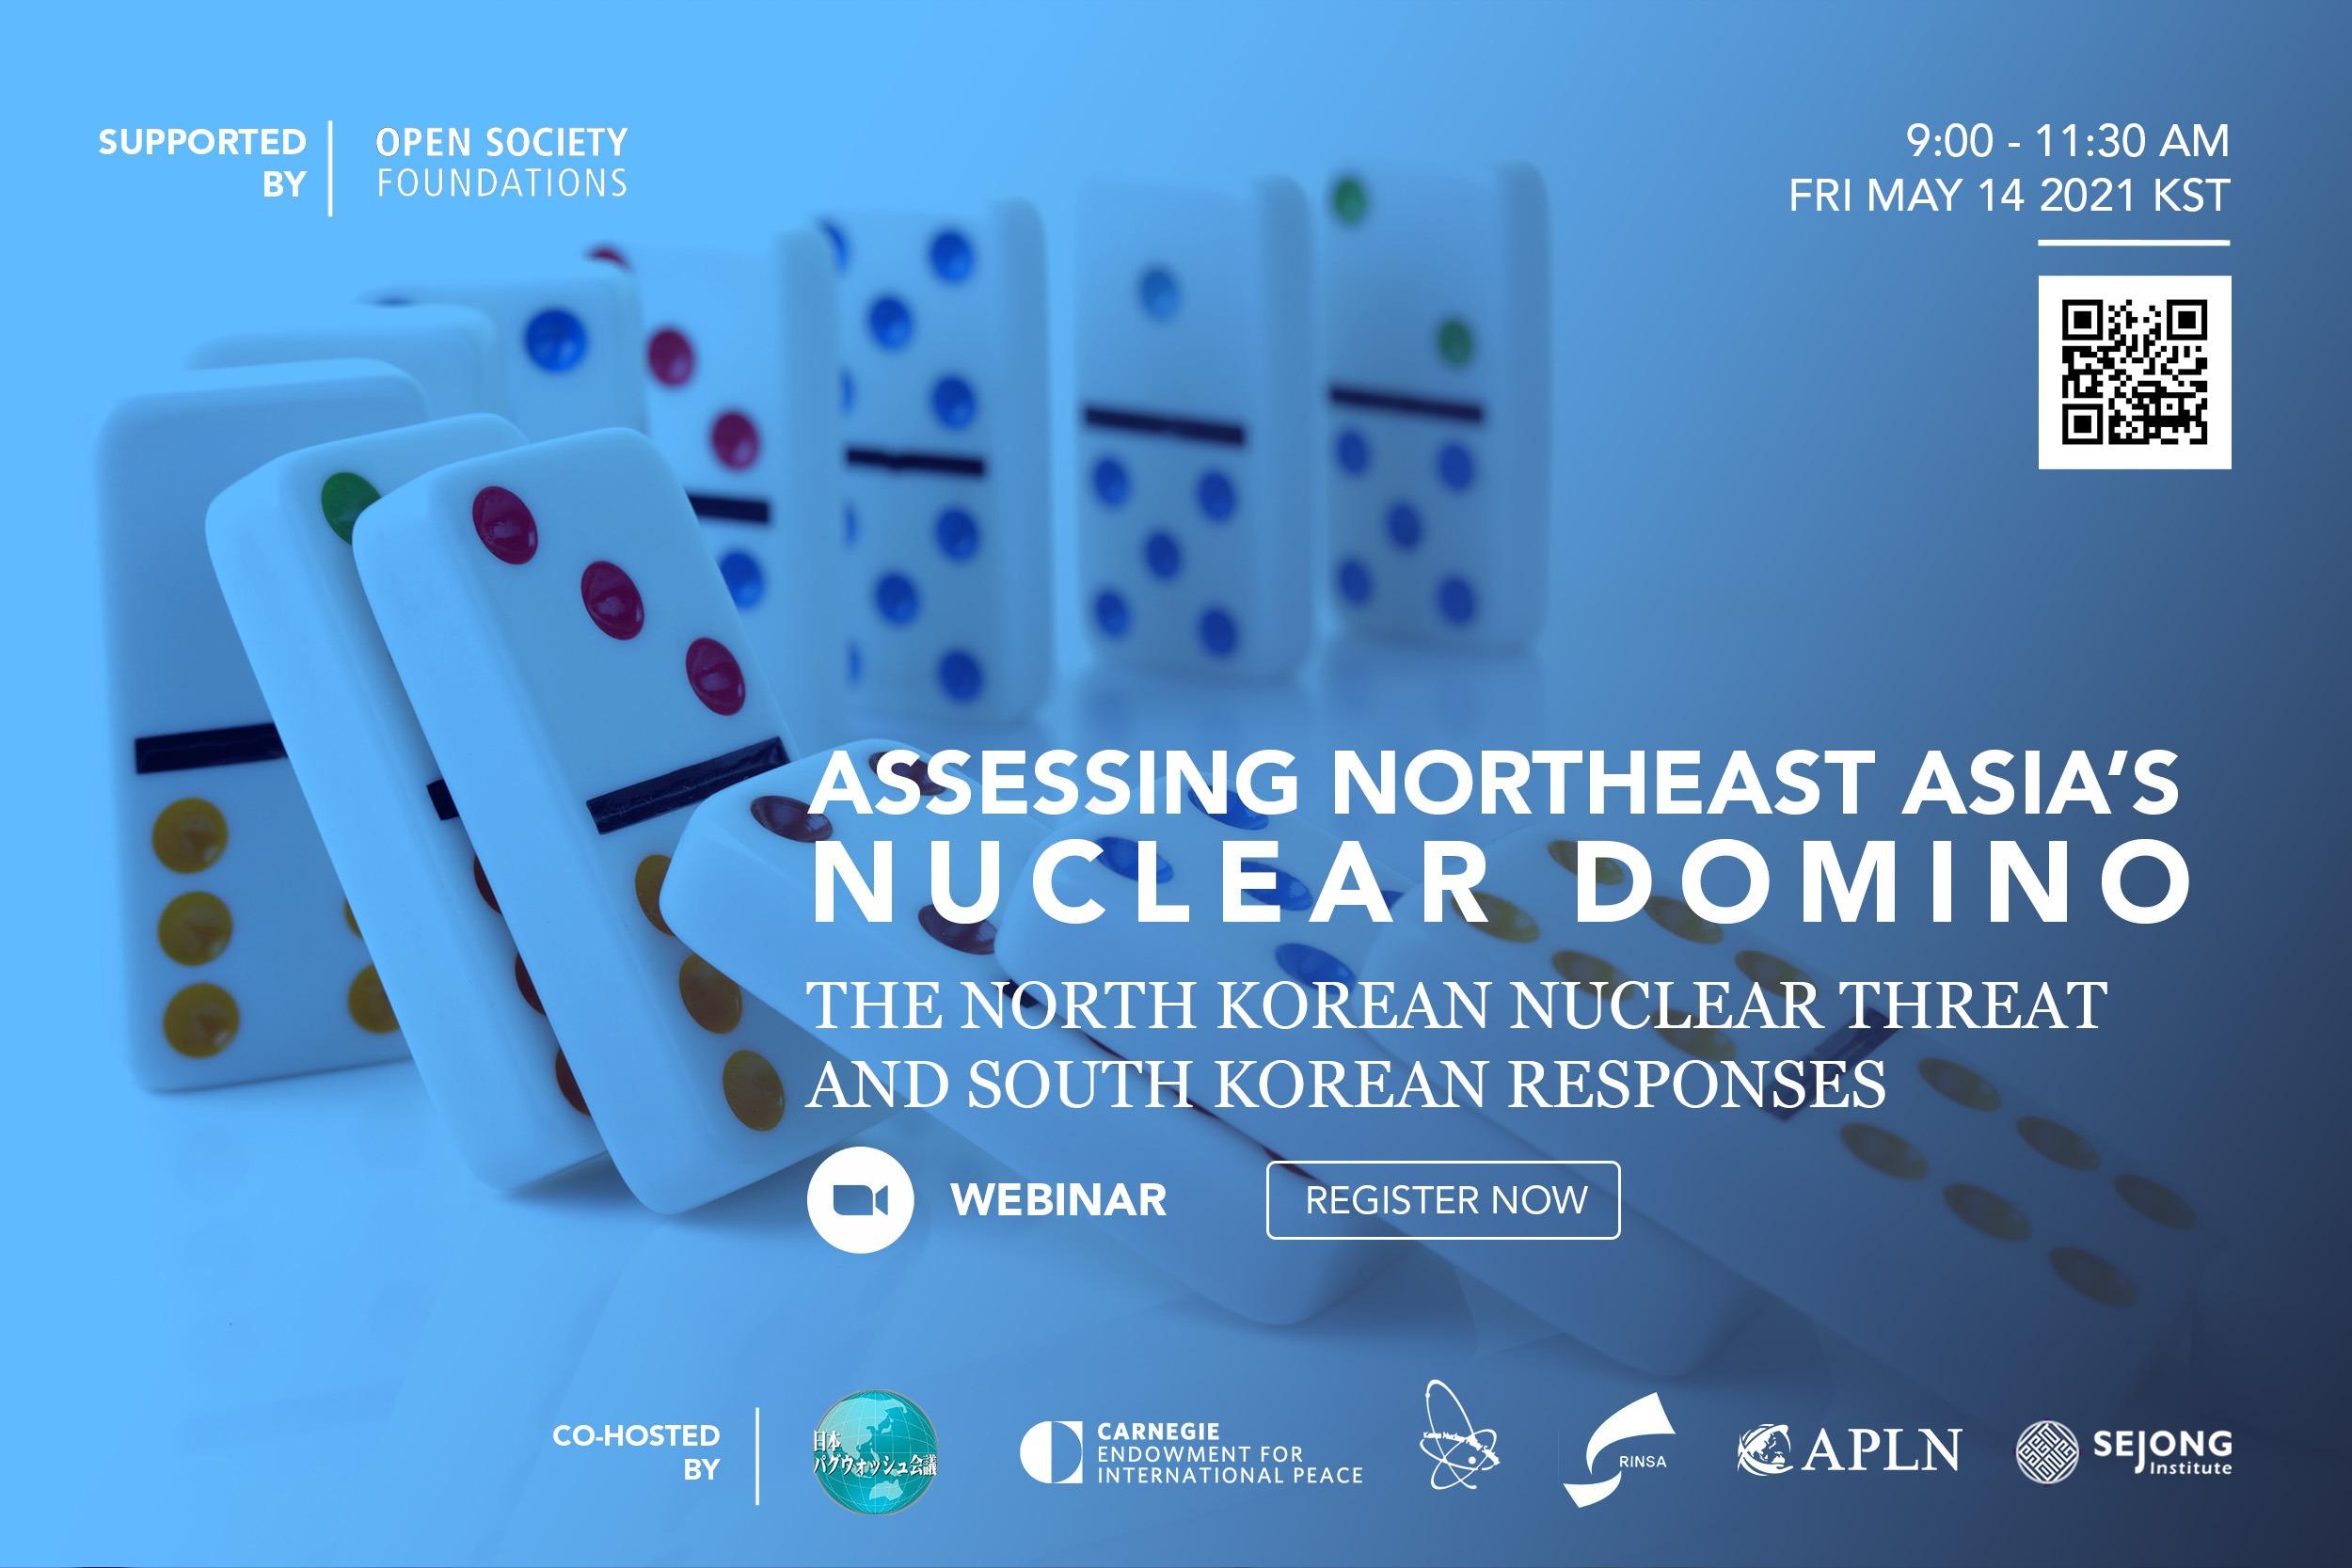 [Seminar] Assessing Northeast Asia Nuclear Domino